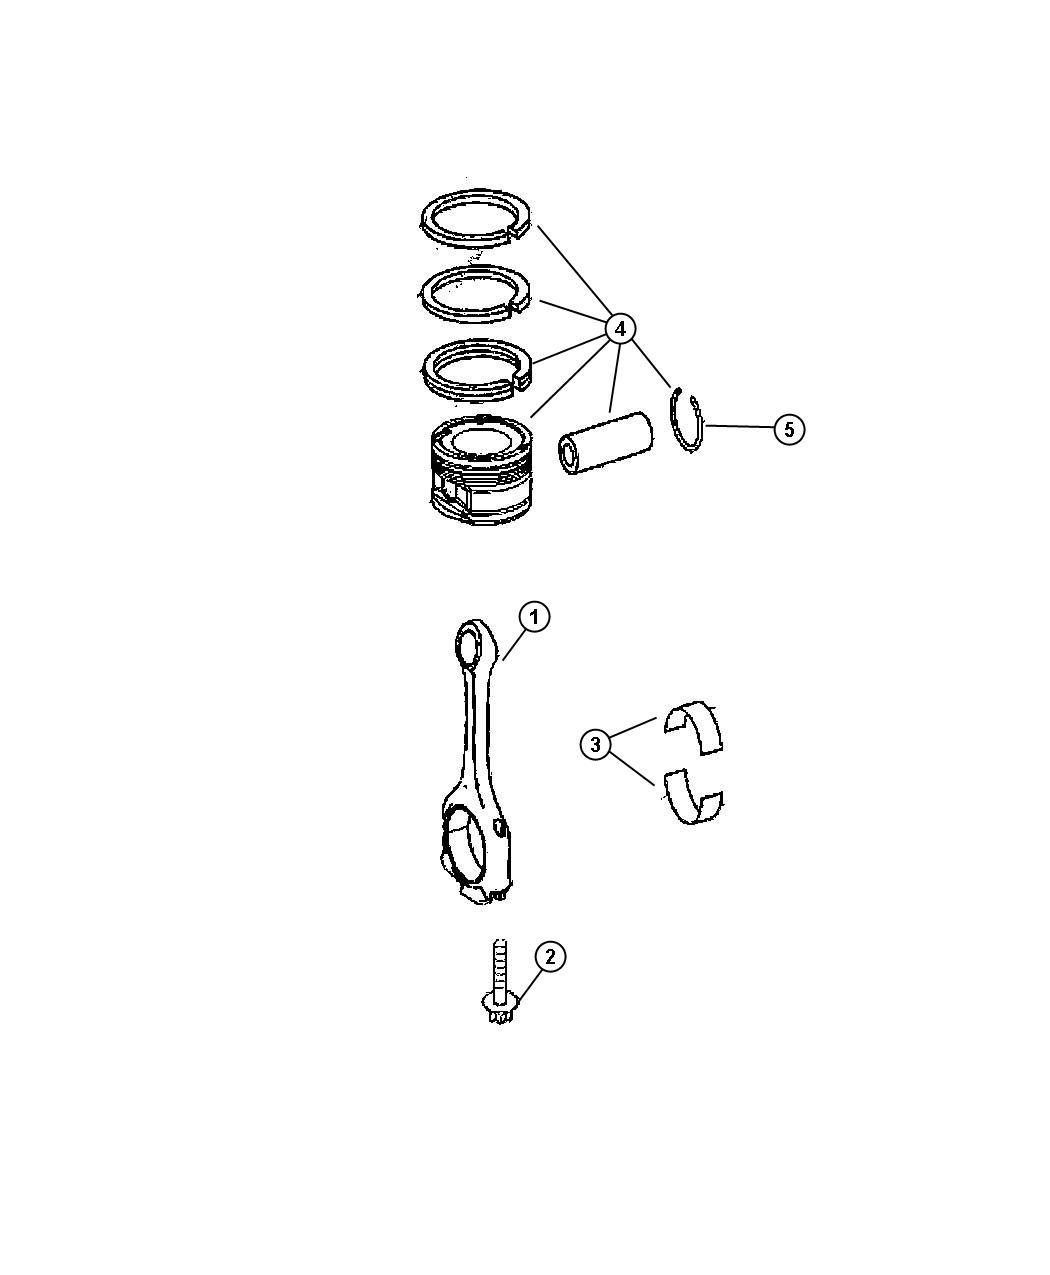 Dodge Sprinter Bearing Connecting Rod Piston Engine Crankshaft